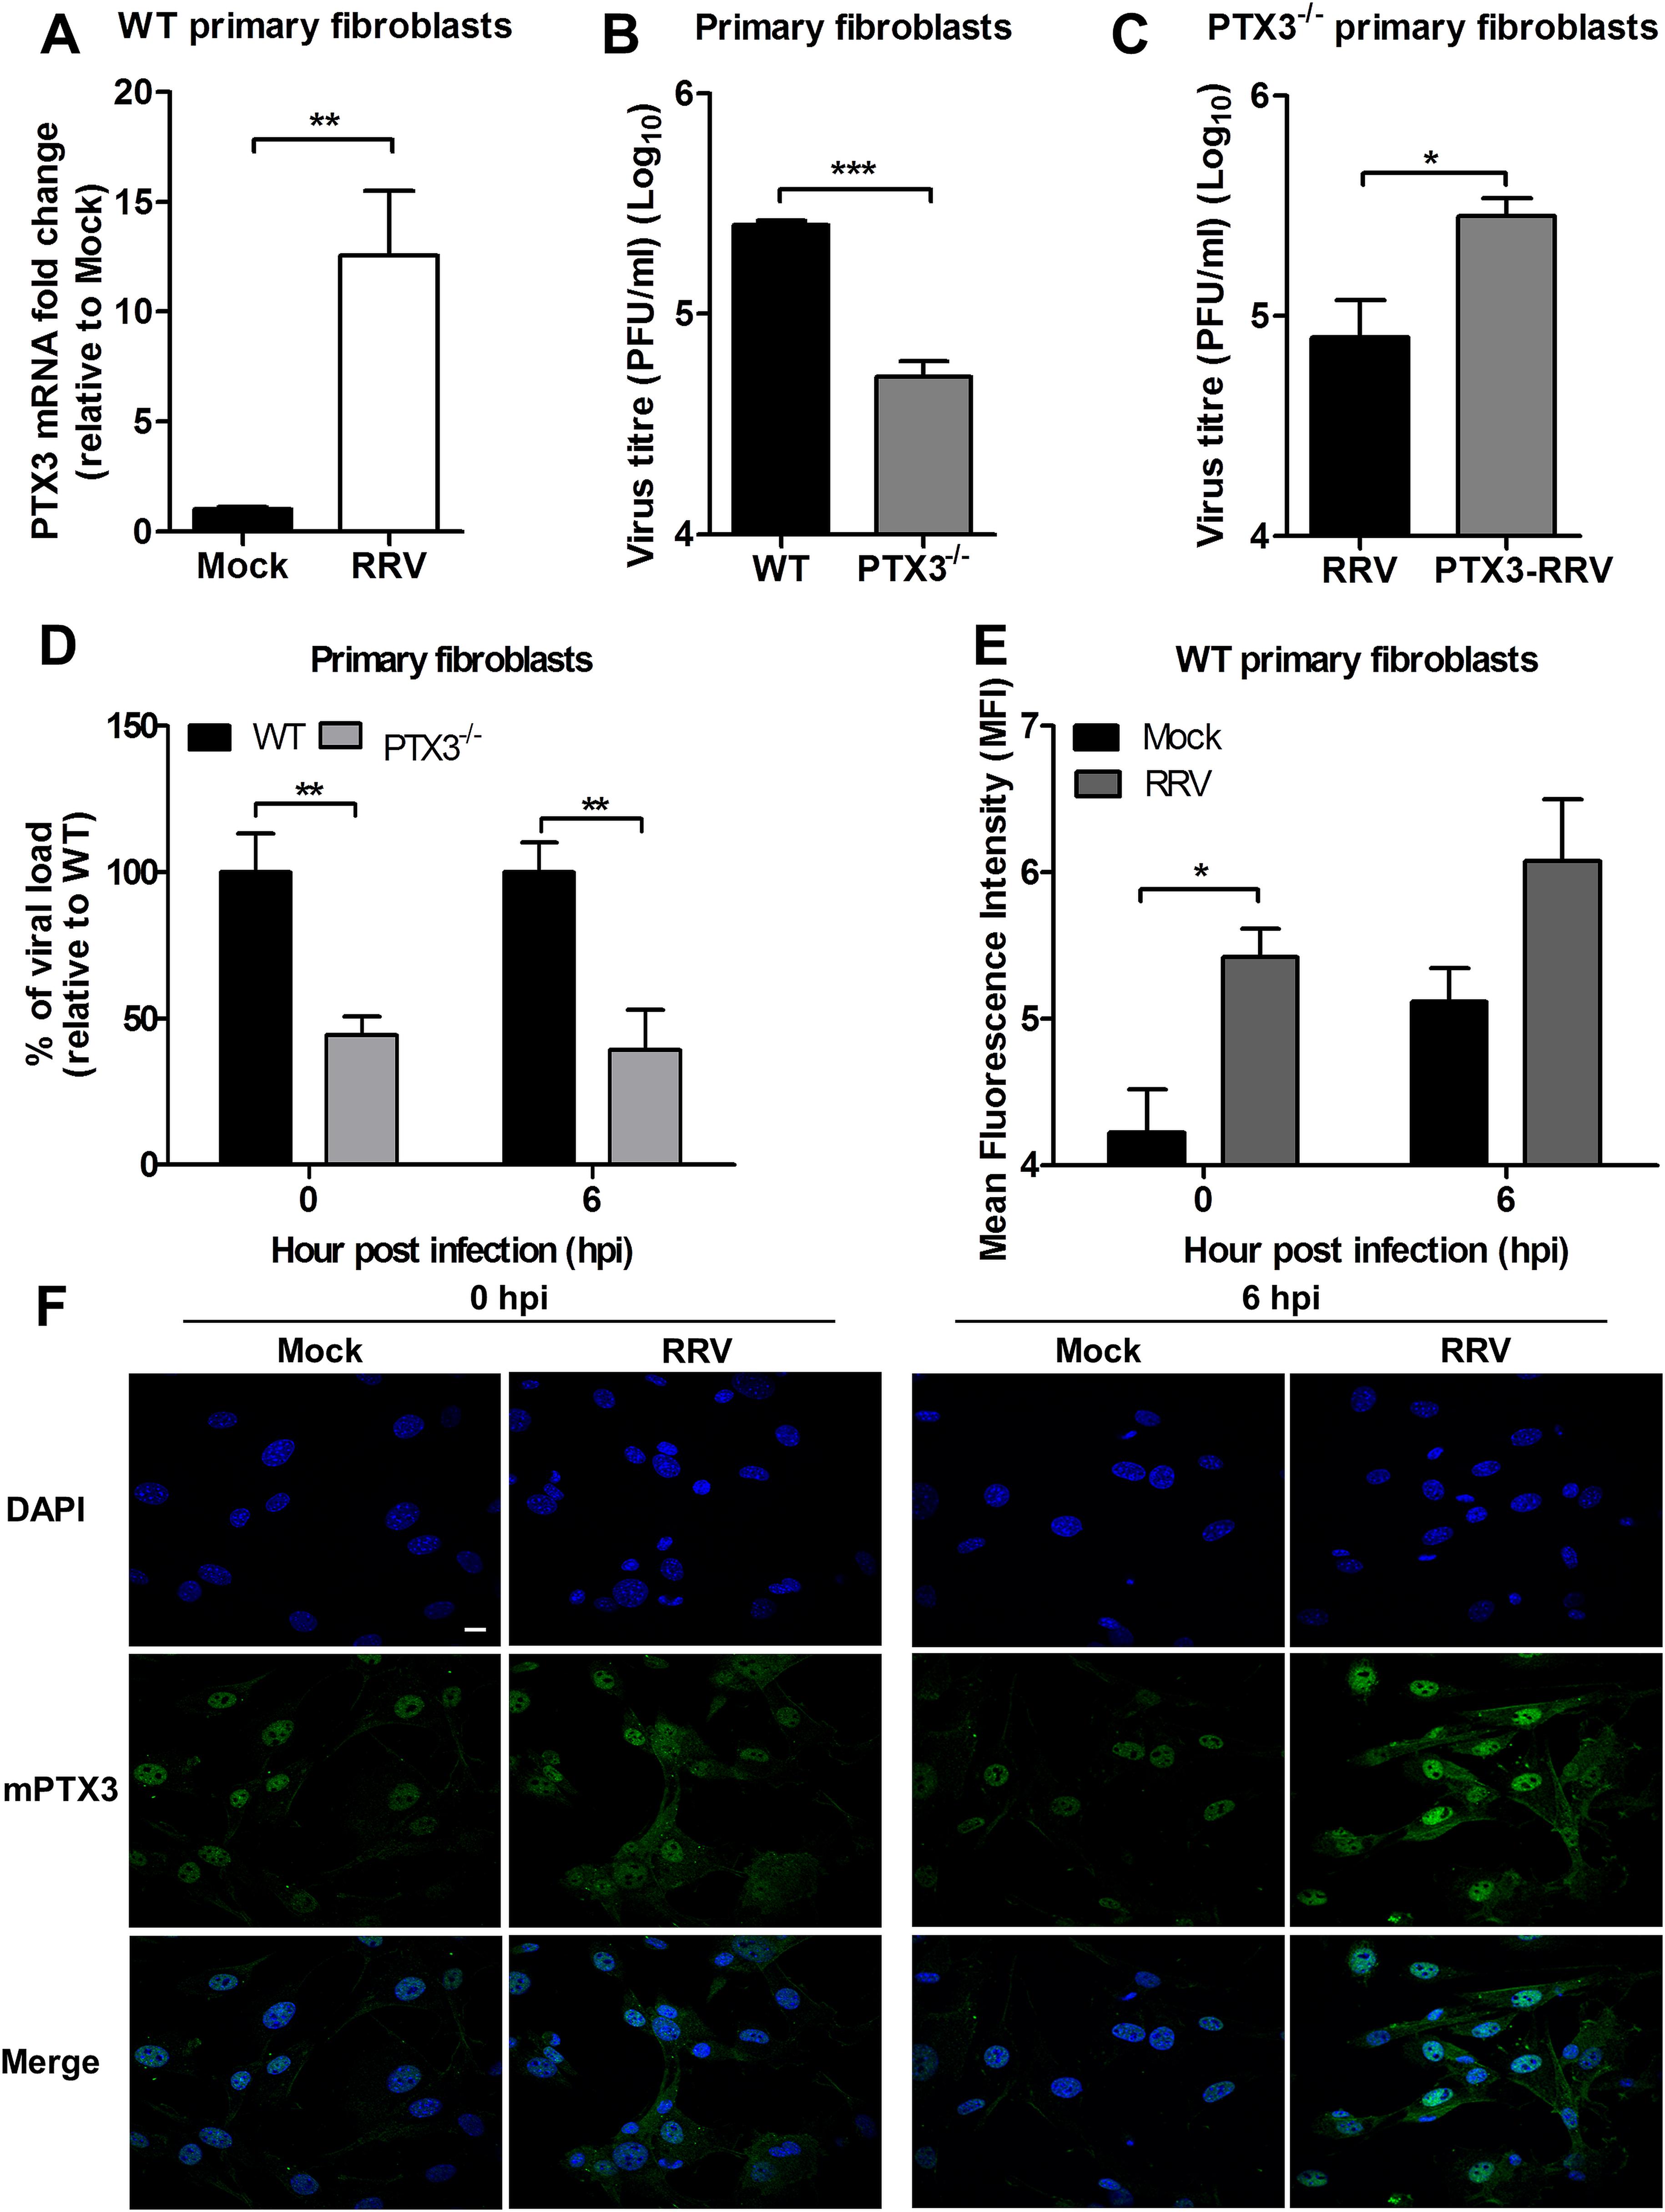 PTX3 enhances RRV replication in murine primary fibroblasts.